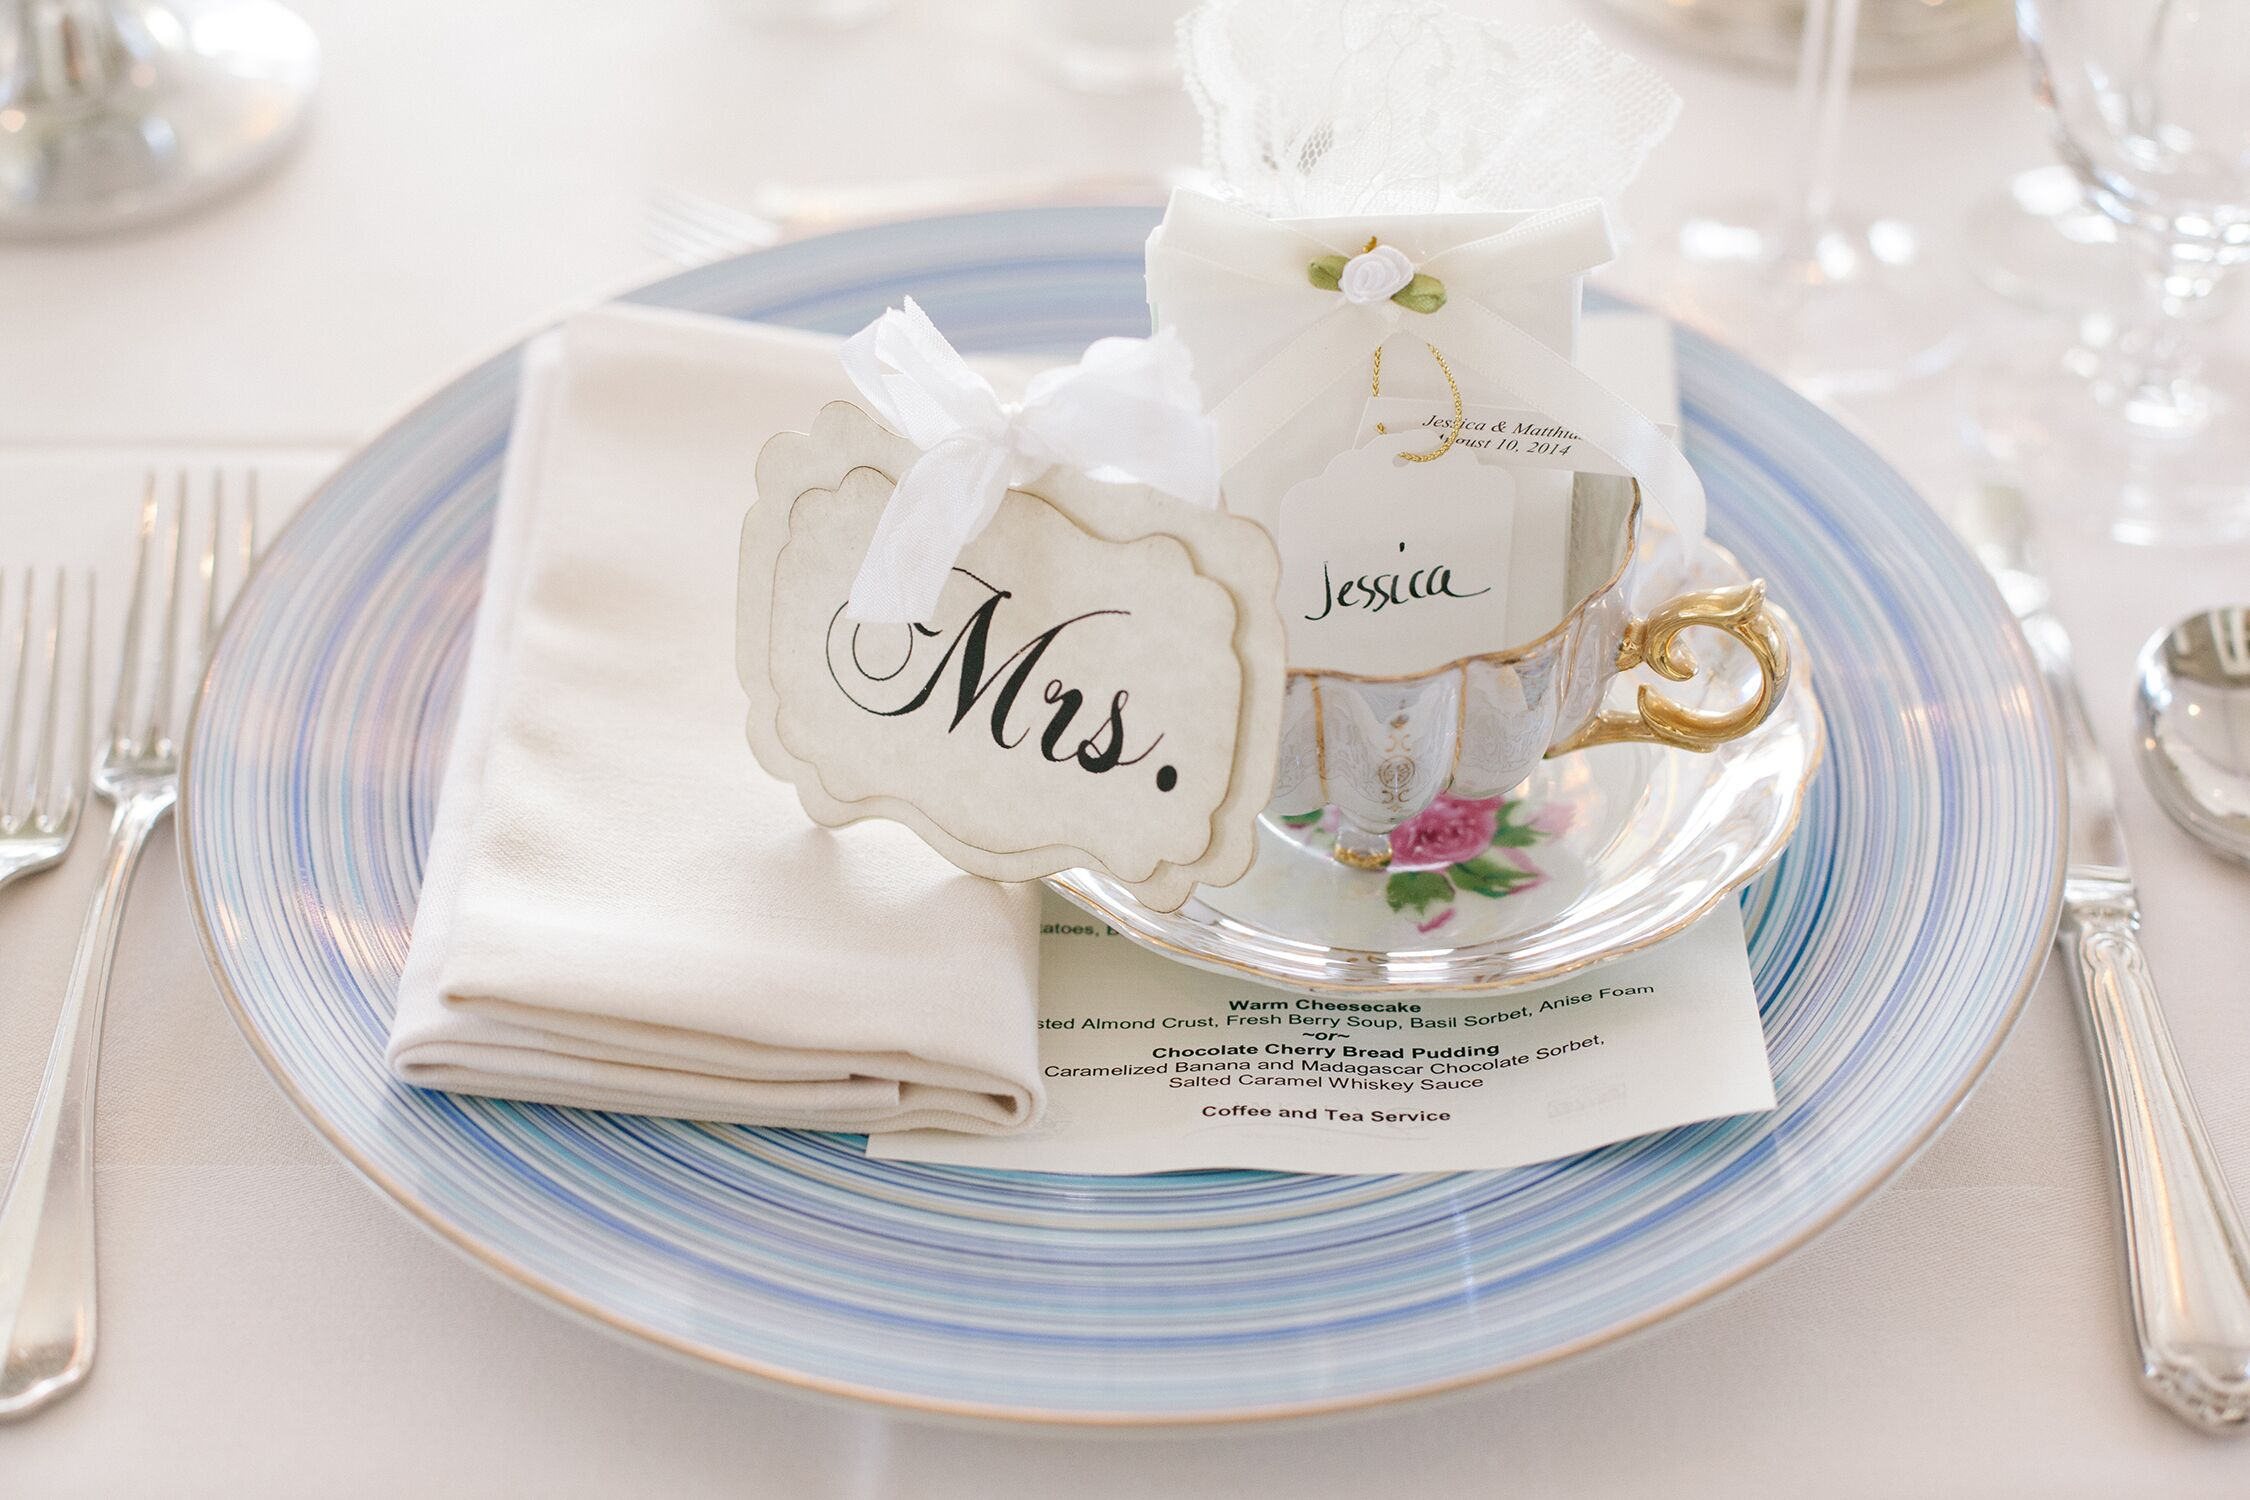 Vintage Teacup and Saucer Wedding Favors